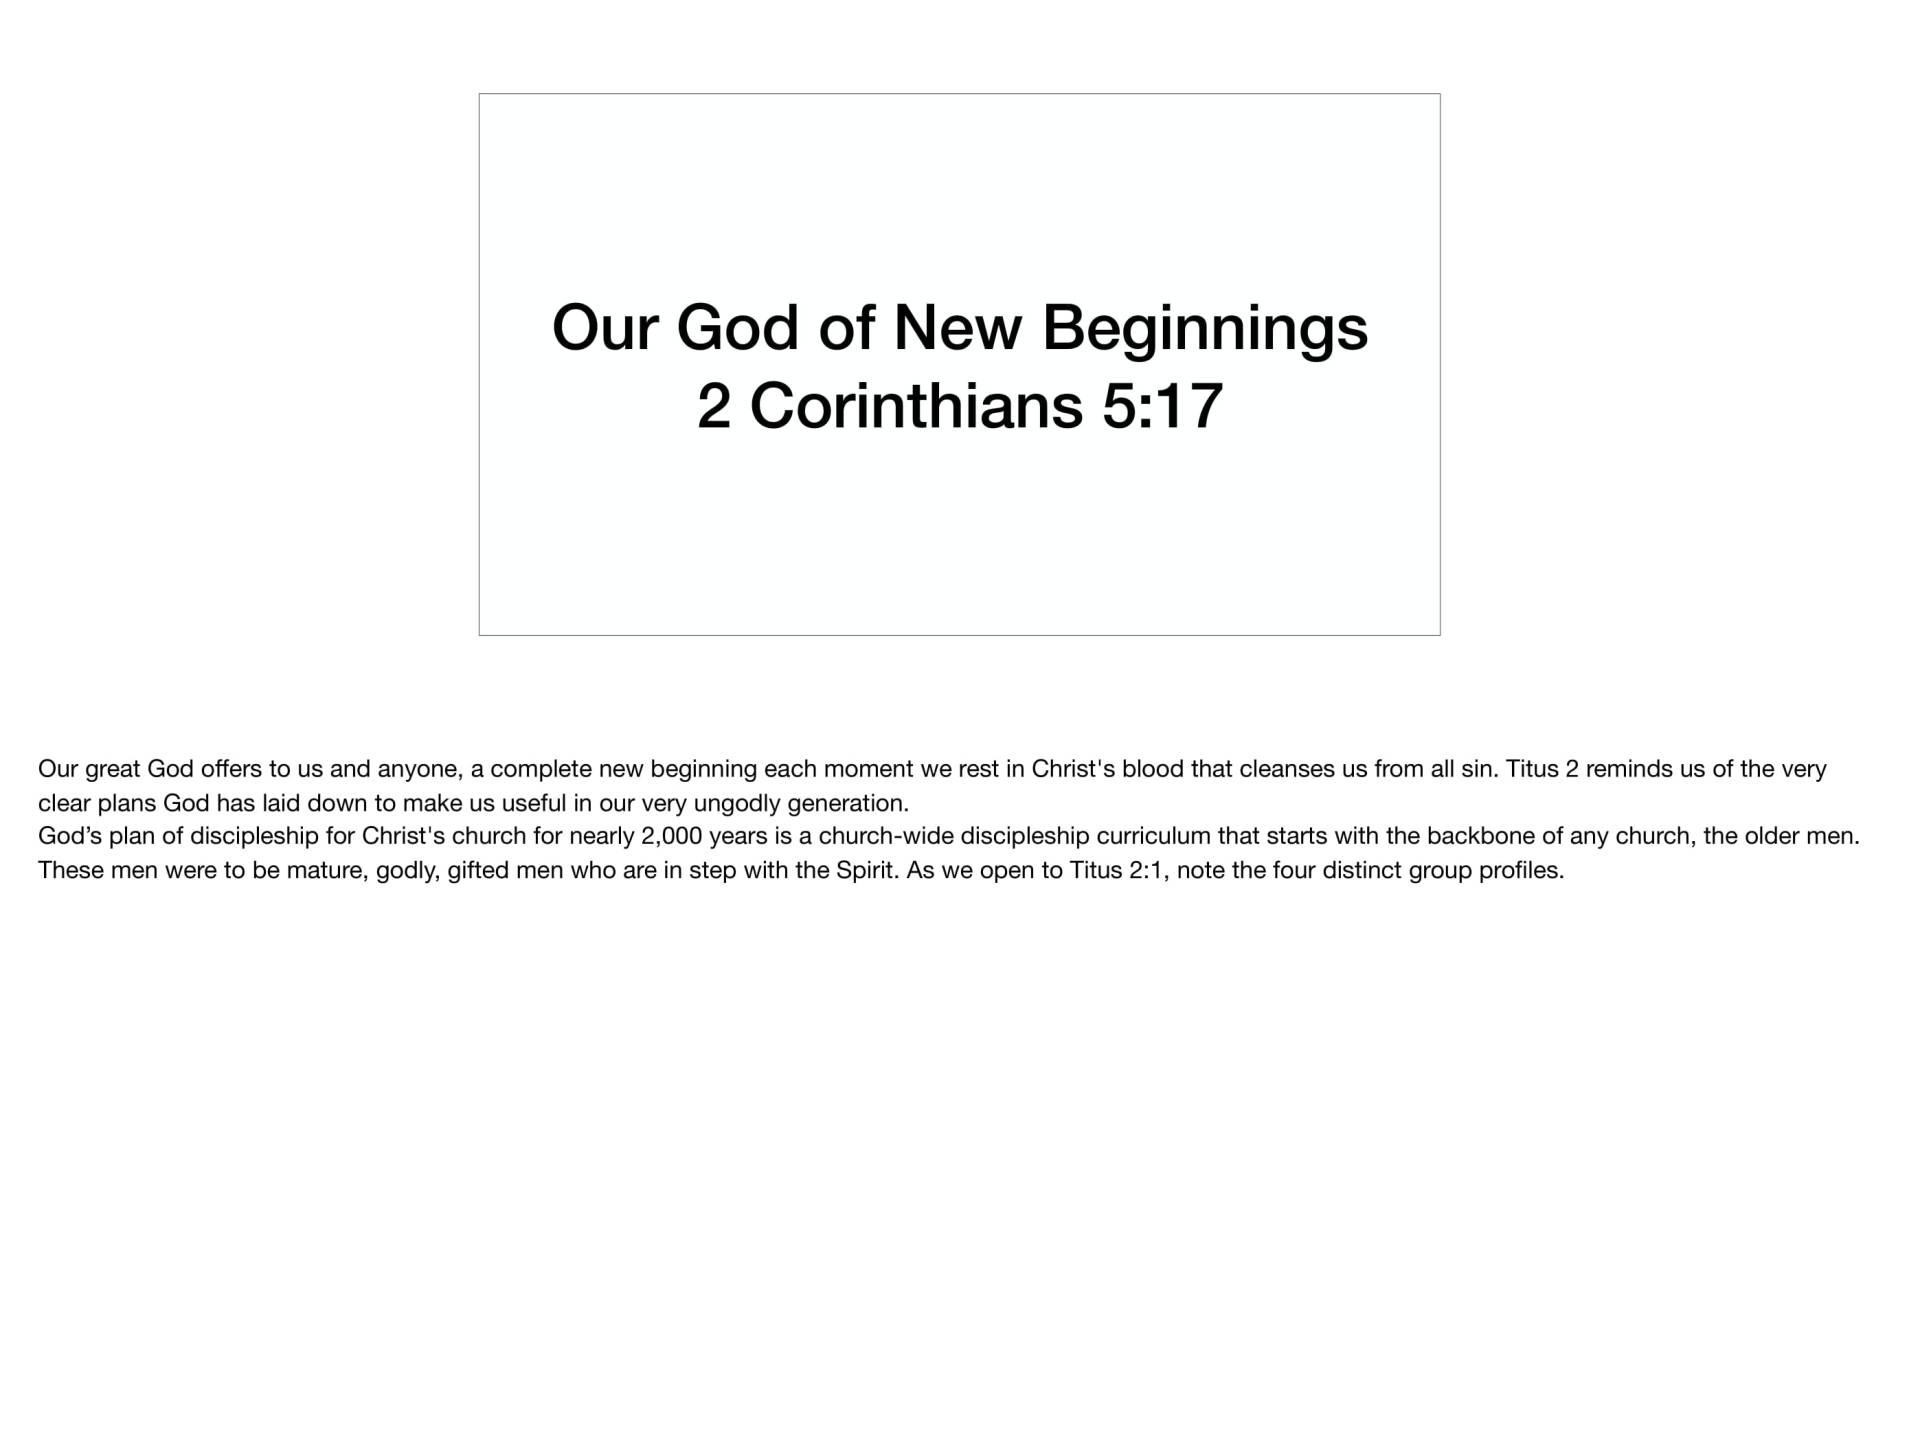 LGI-01 - God's Recovery Program Is Sanctification-09